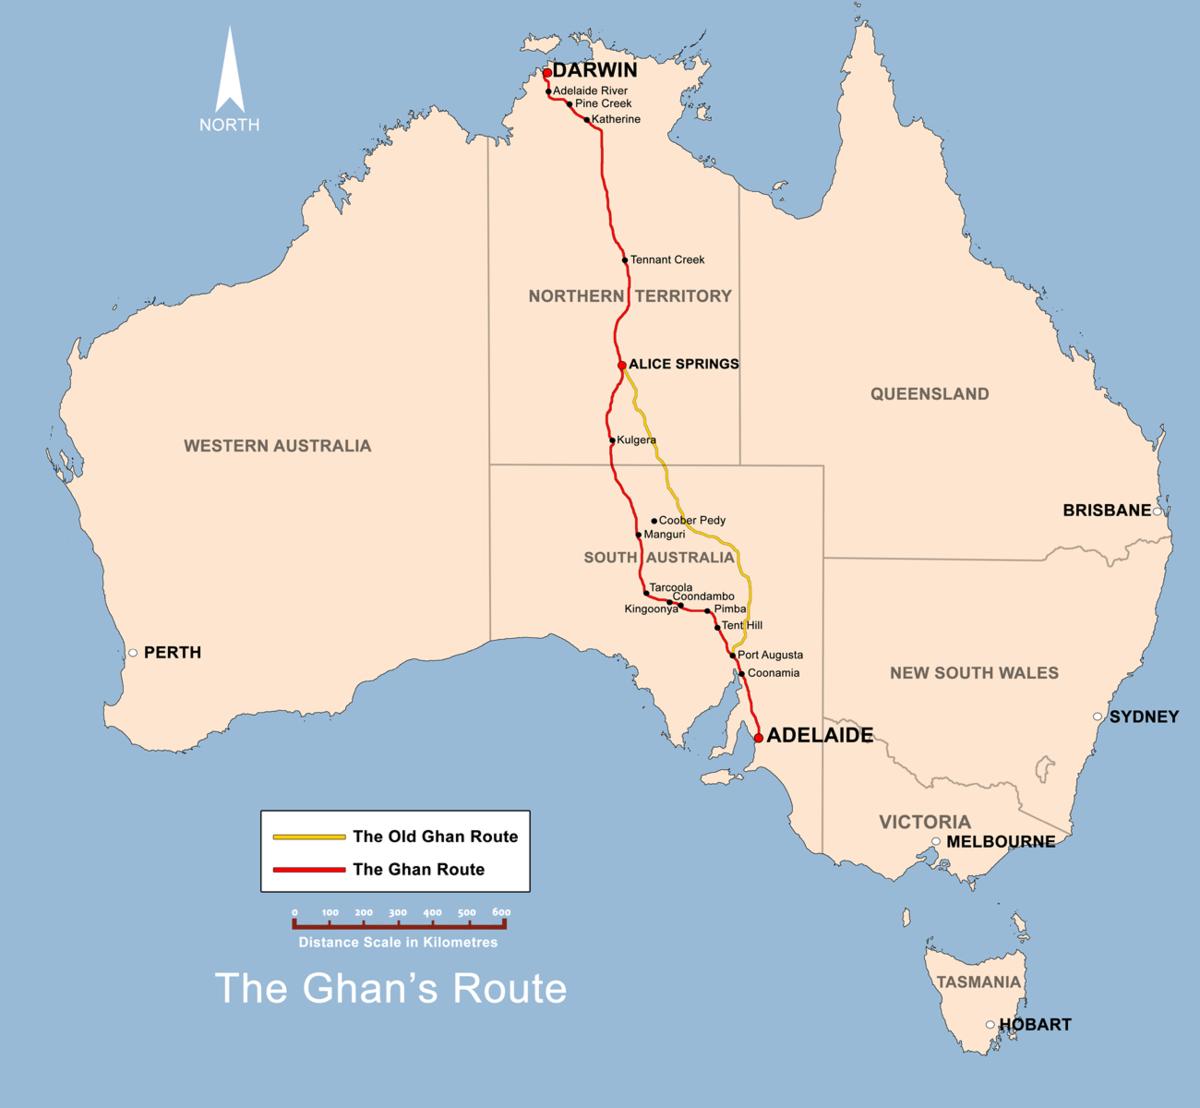 Map Of South Australia And Northern Territory.Adelaide Darwin Railway Wikipedia